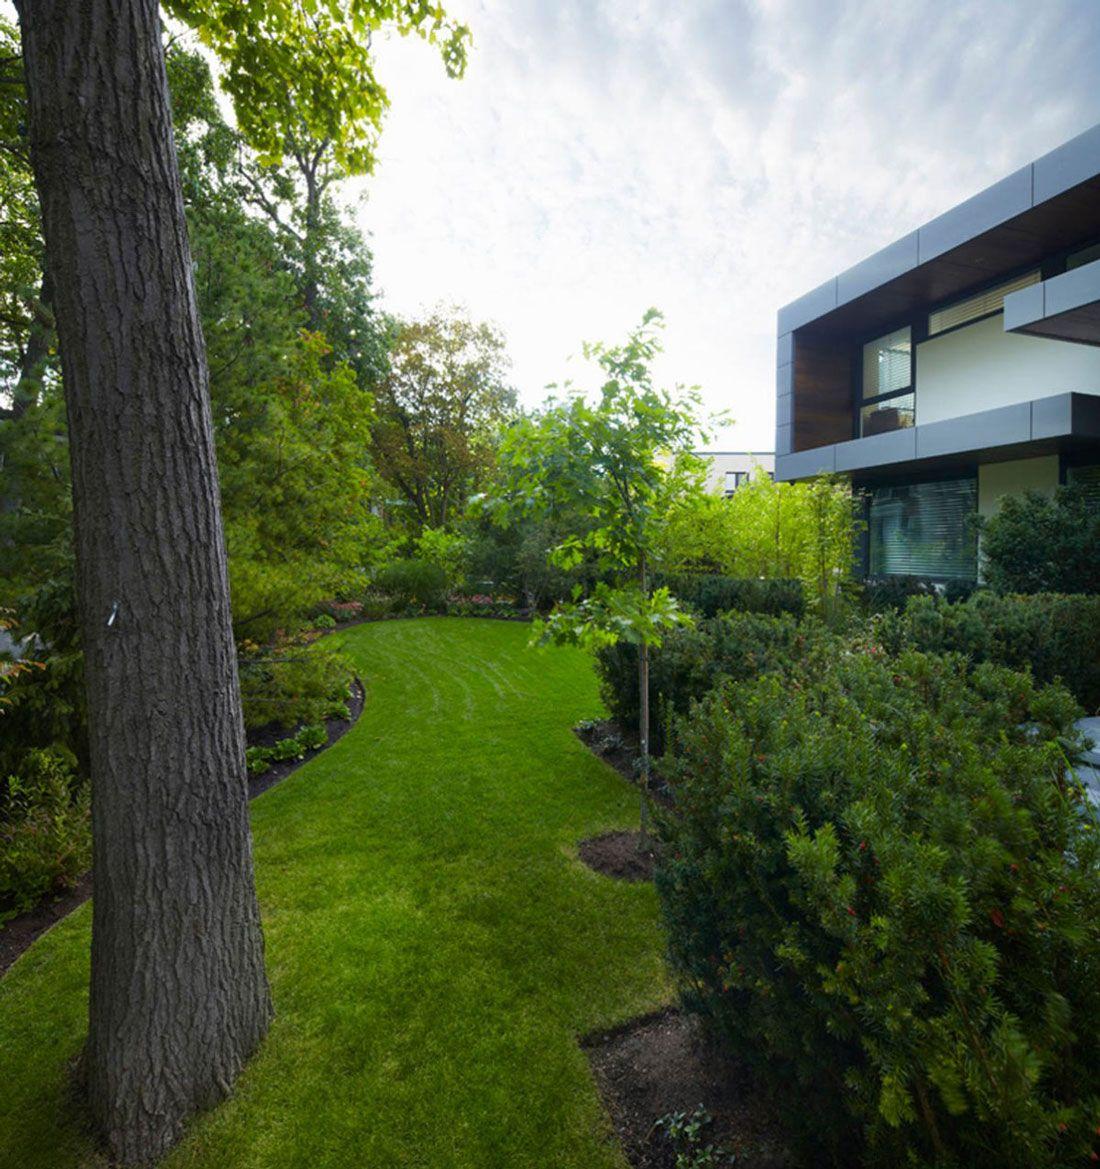 Lawn, Garden, Impressive Modern Home in Toronto, Canada | Landscape ...